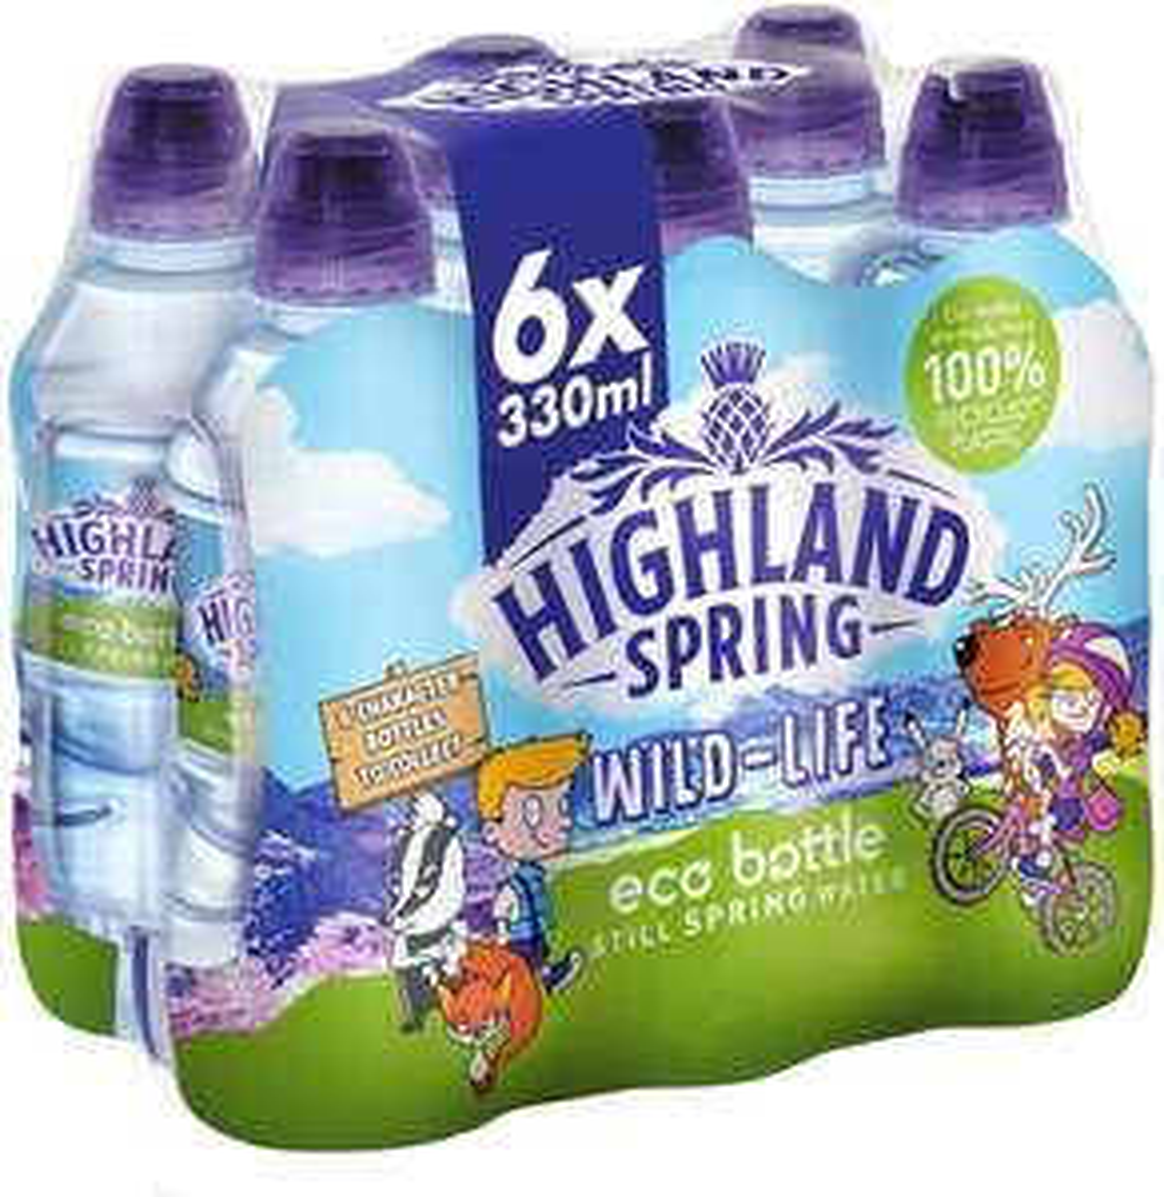 Highland Spring Kids Eco Bottle Still Water, 6 x 330 ml Sports Cap £1.25 (£4.49 p&p non prime) @ Amazon